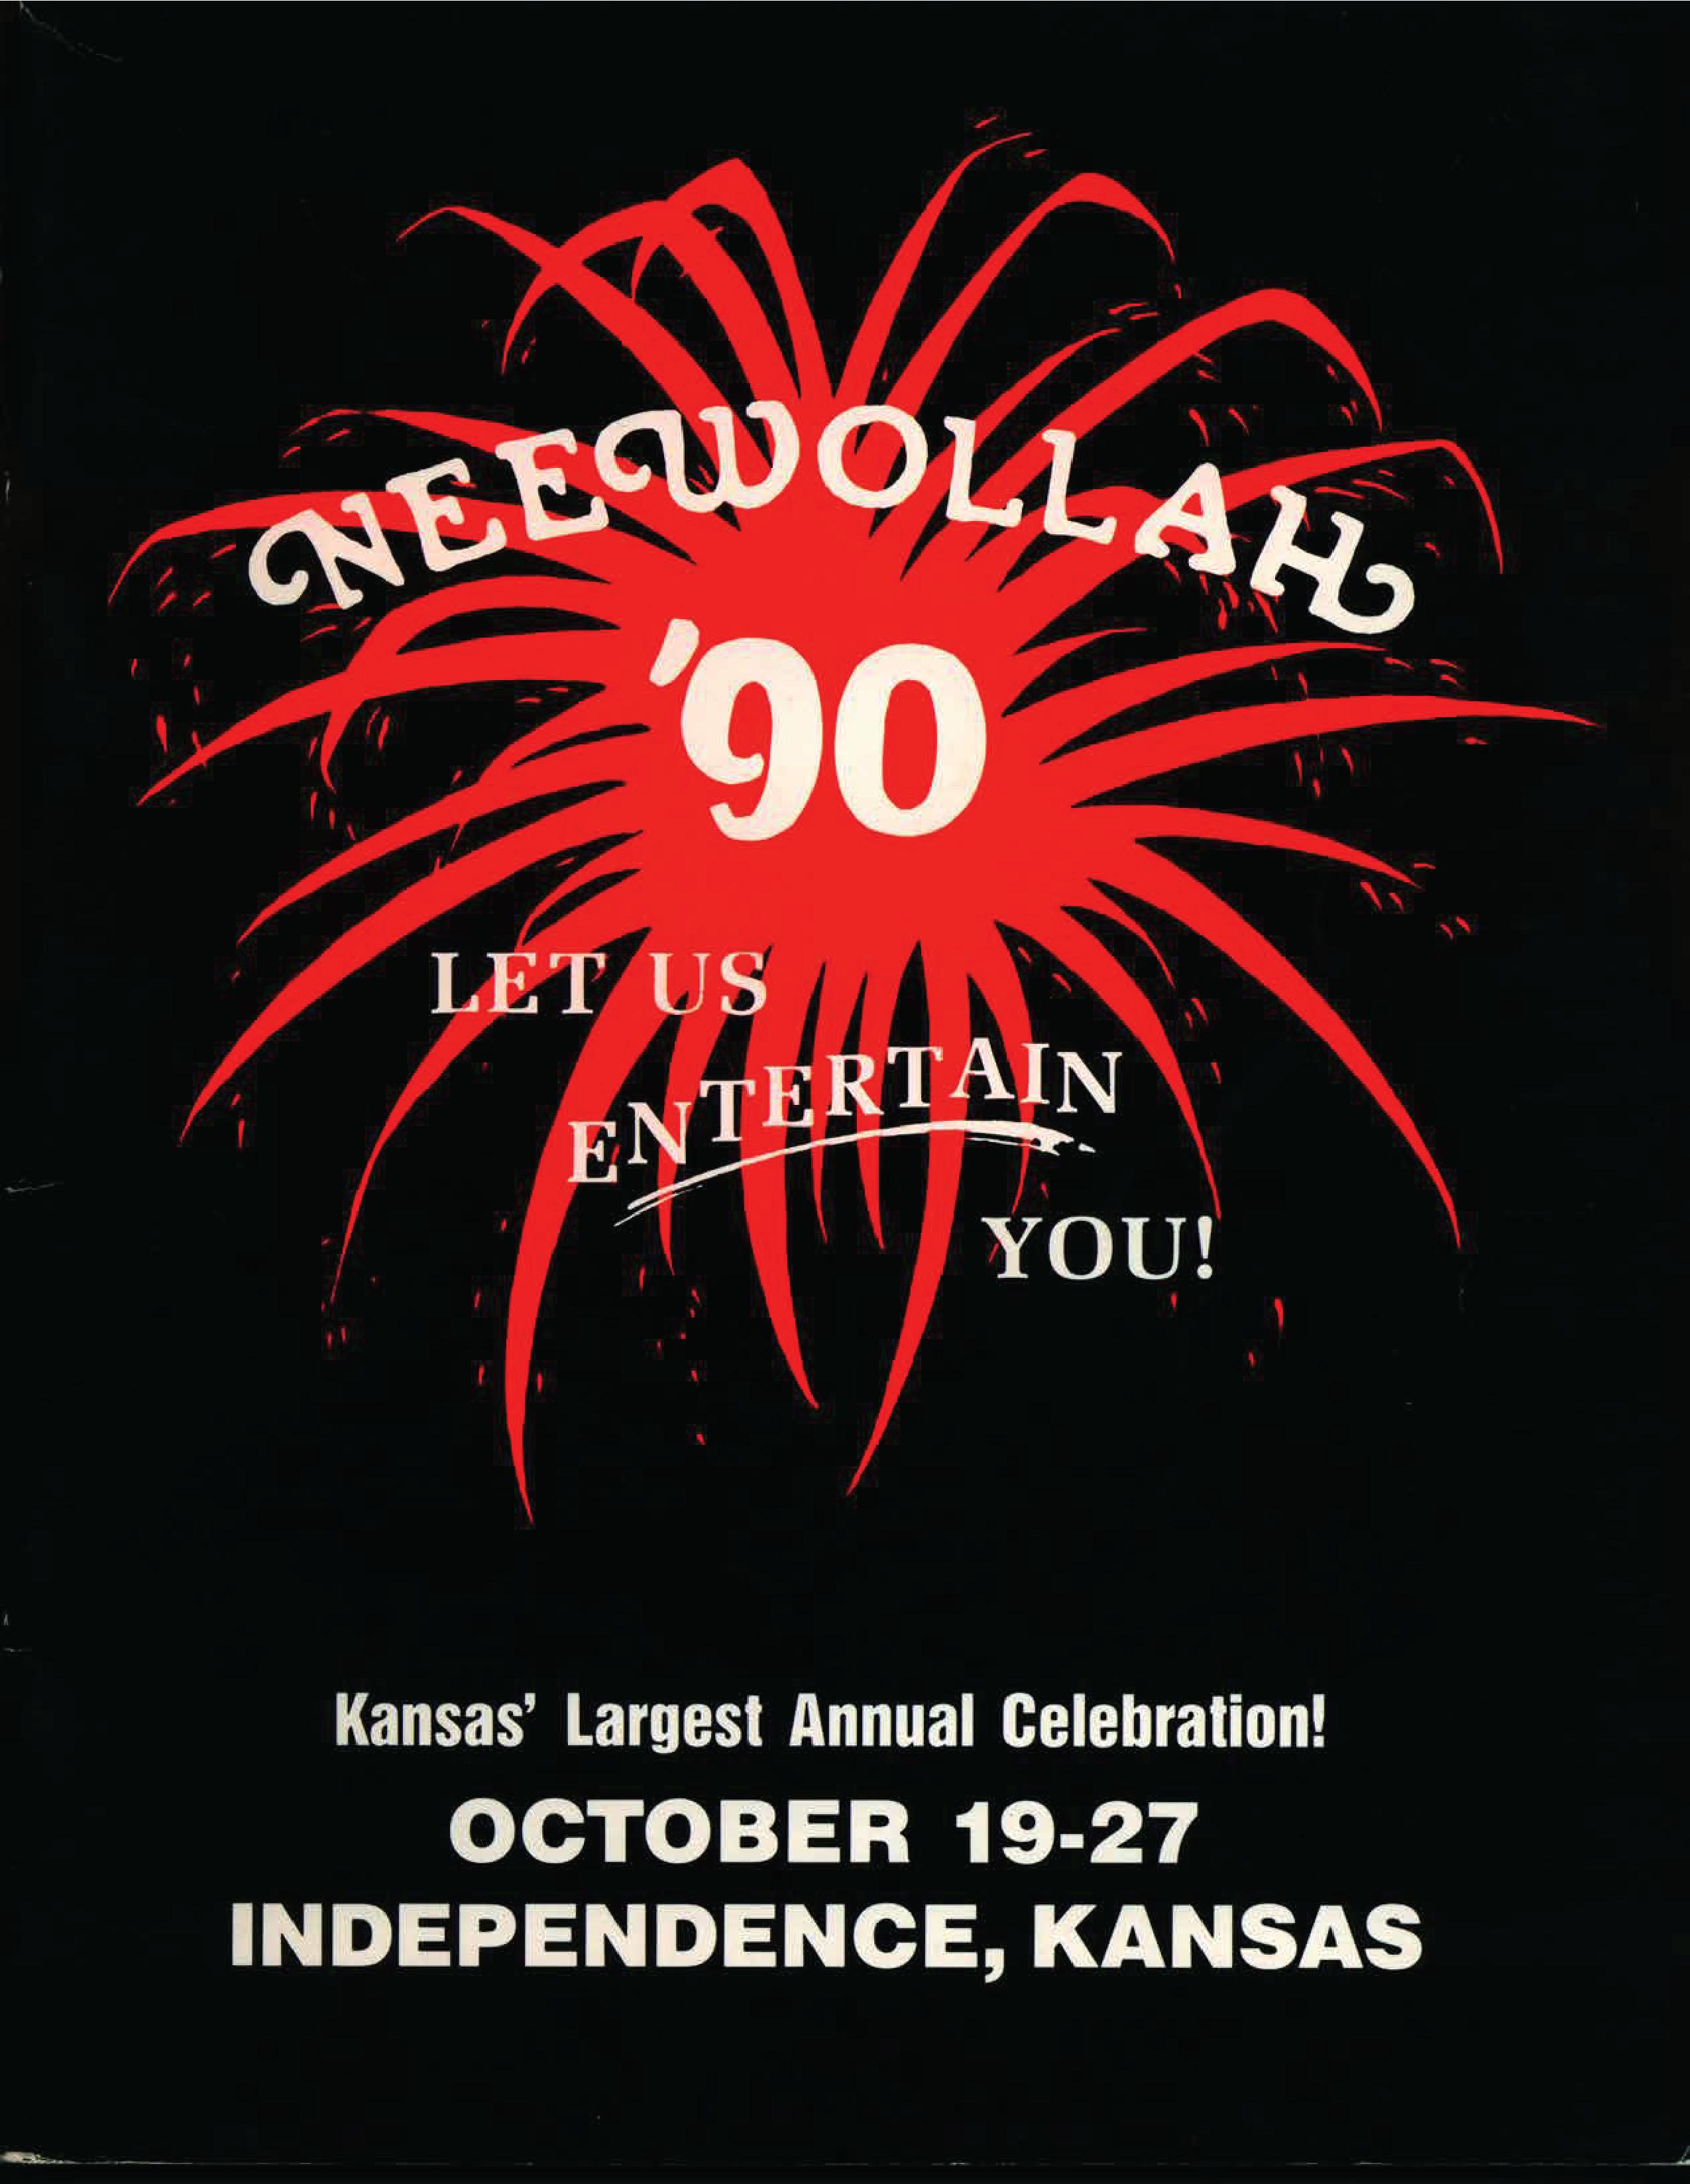 Neewollah 1990 Let Us Entertain You